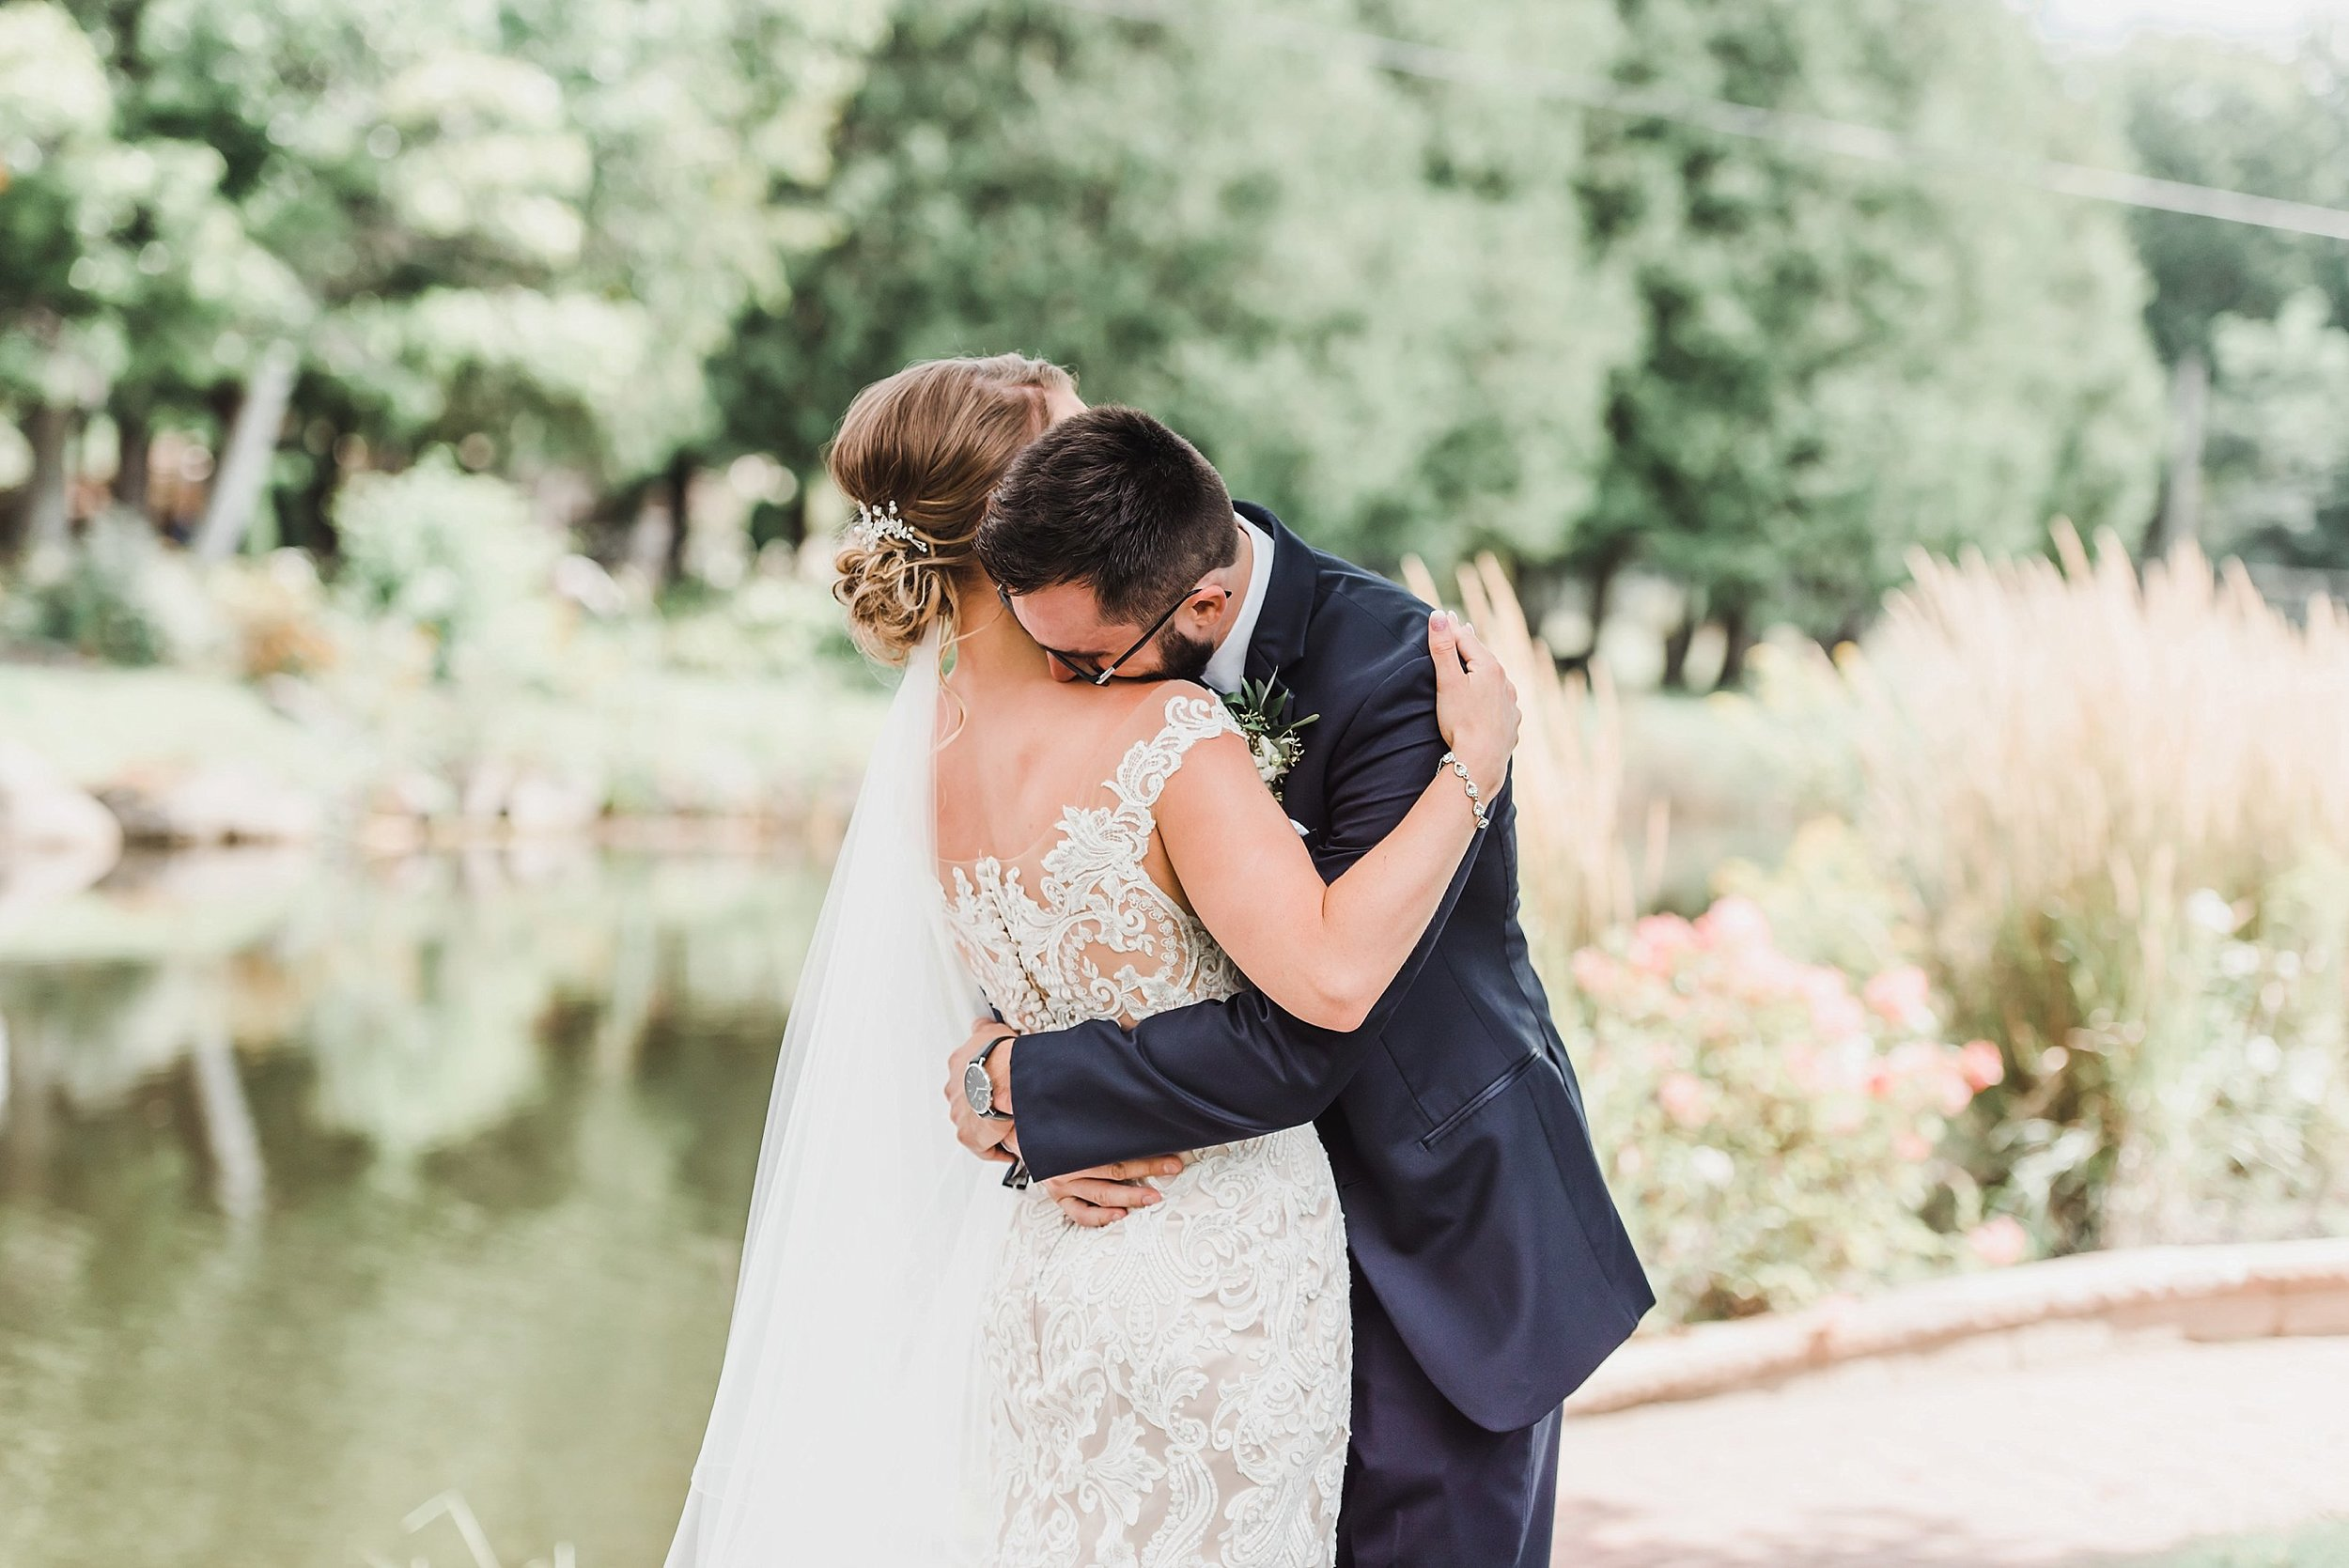 light airy indie fine art ottawa wedding photographer | Ali and Batoul Photography_1241.jpg